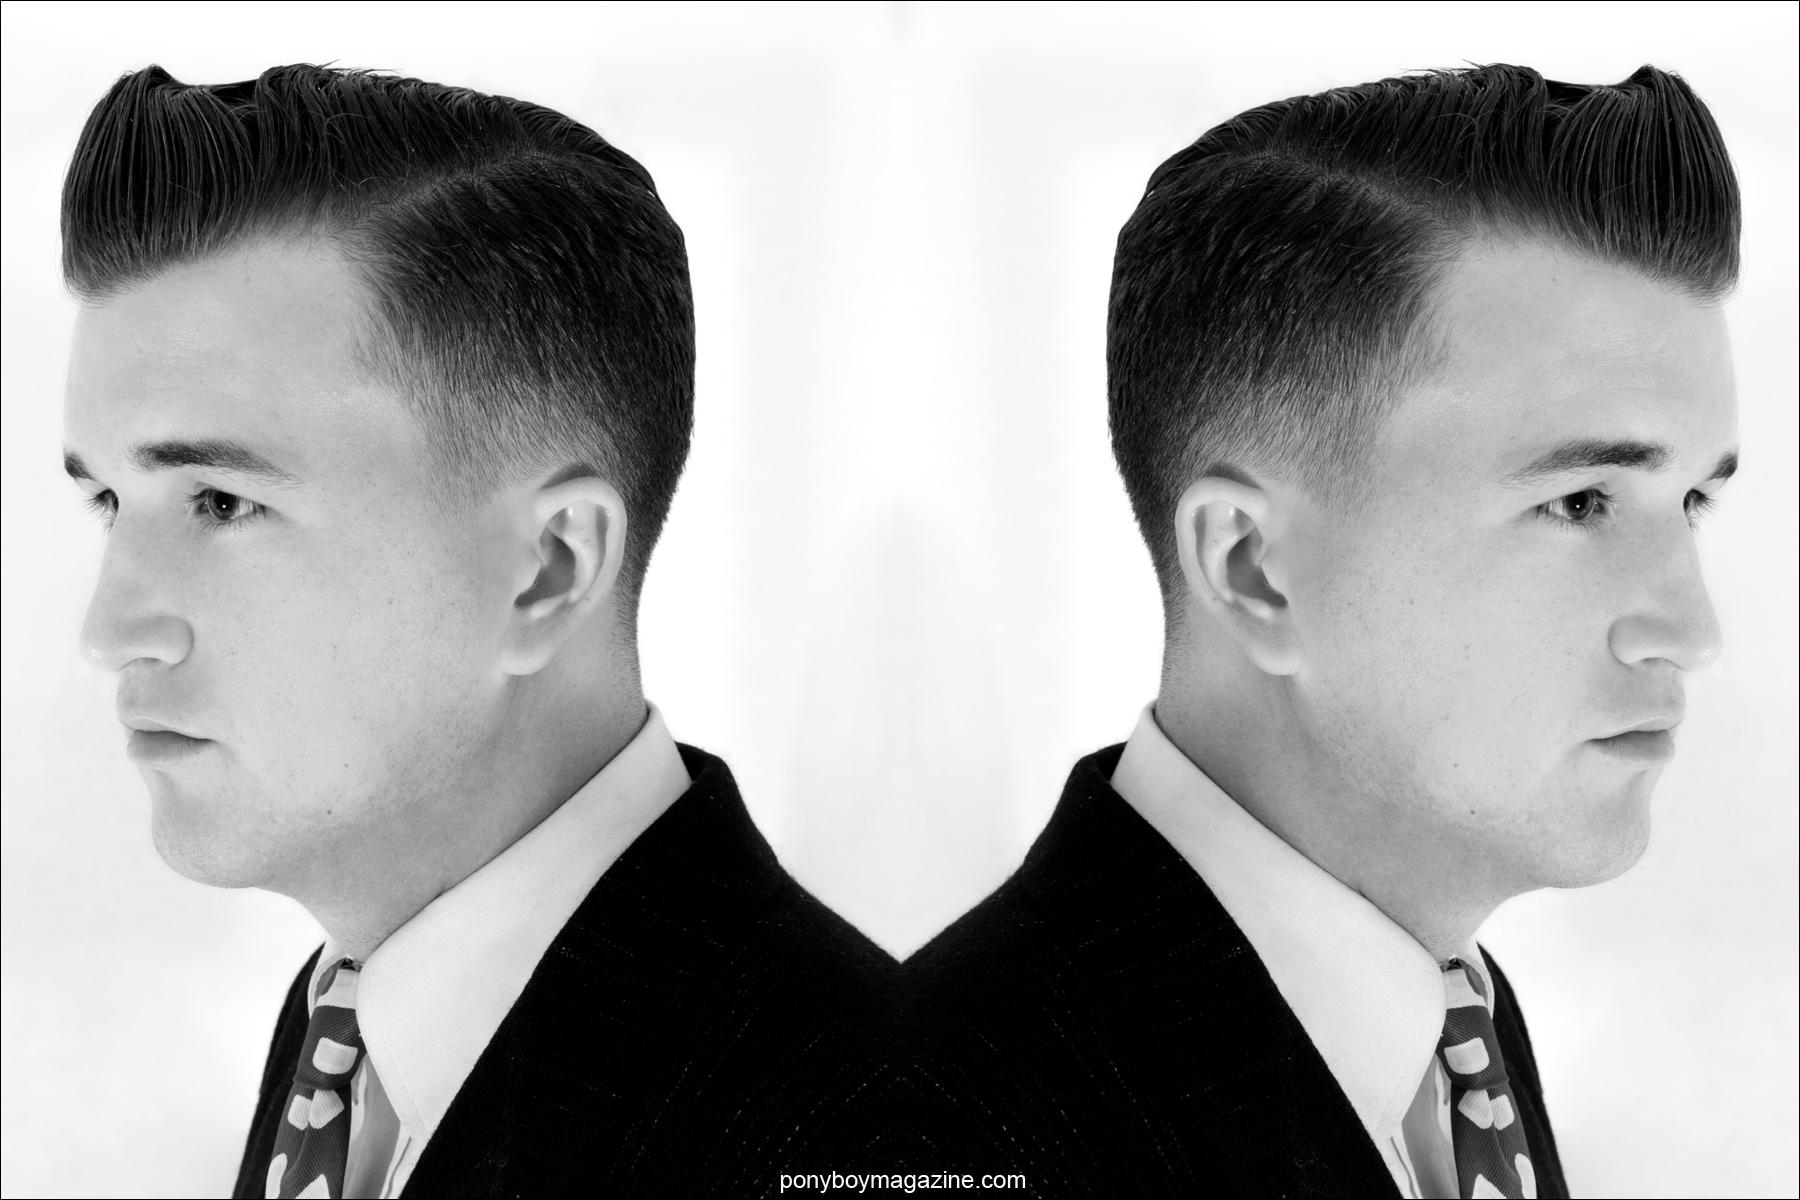 Josh Hi-Fi Sorheim photographed by Alexander Thompson for Ponyboy Magazine.